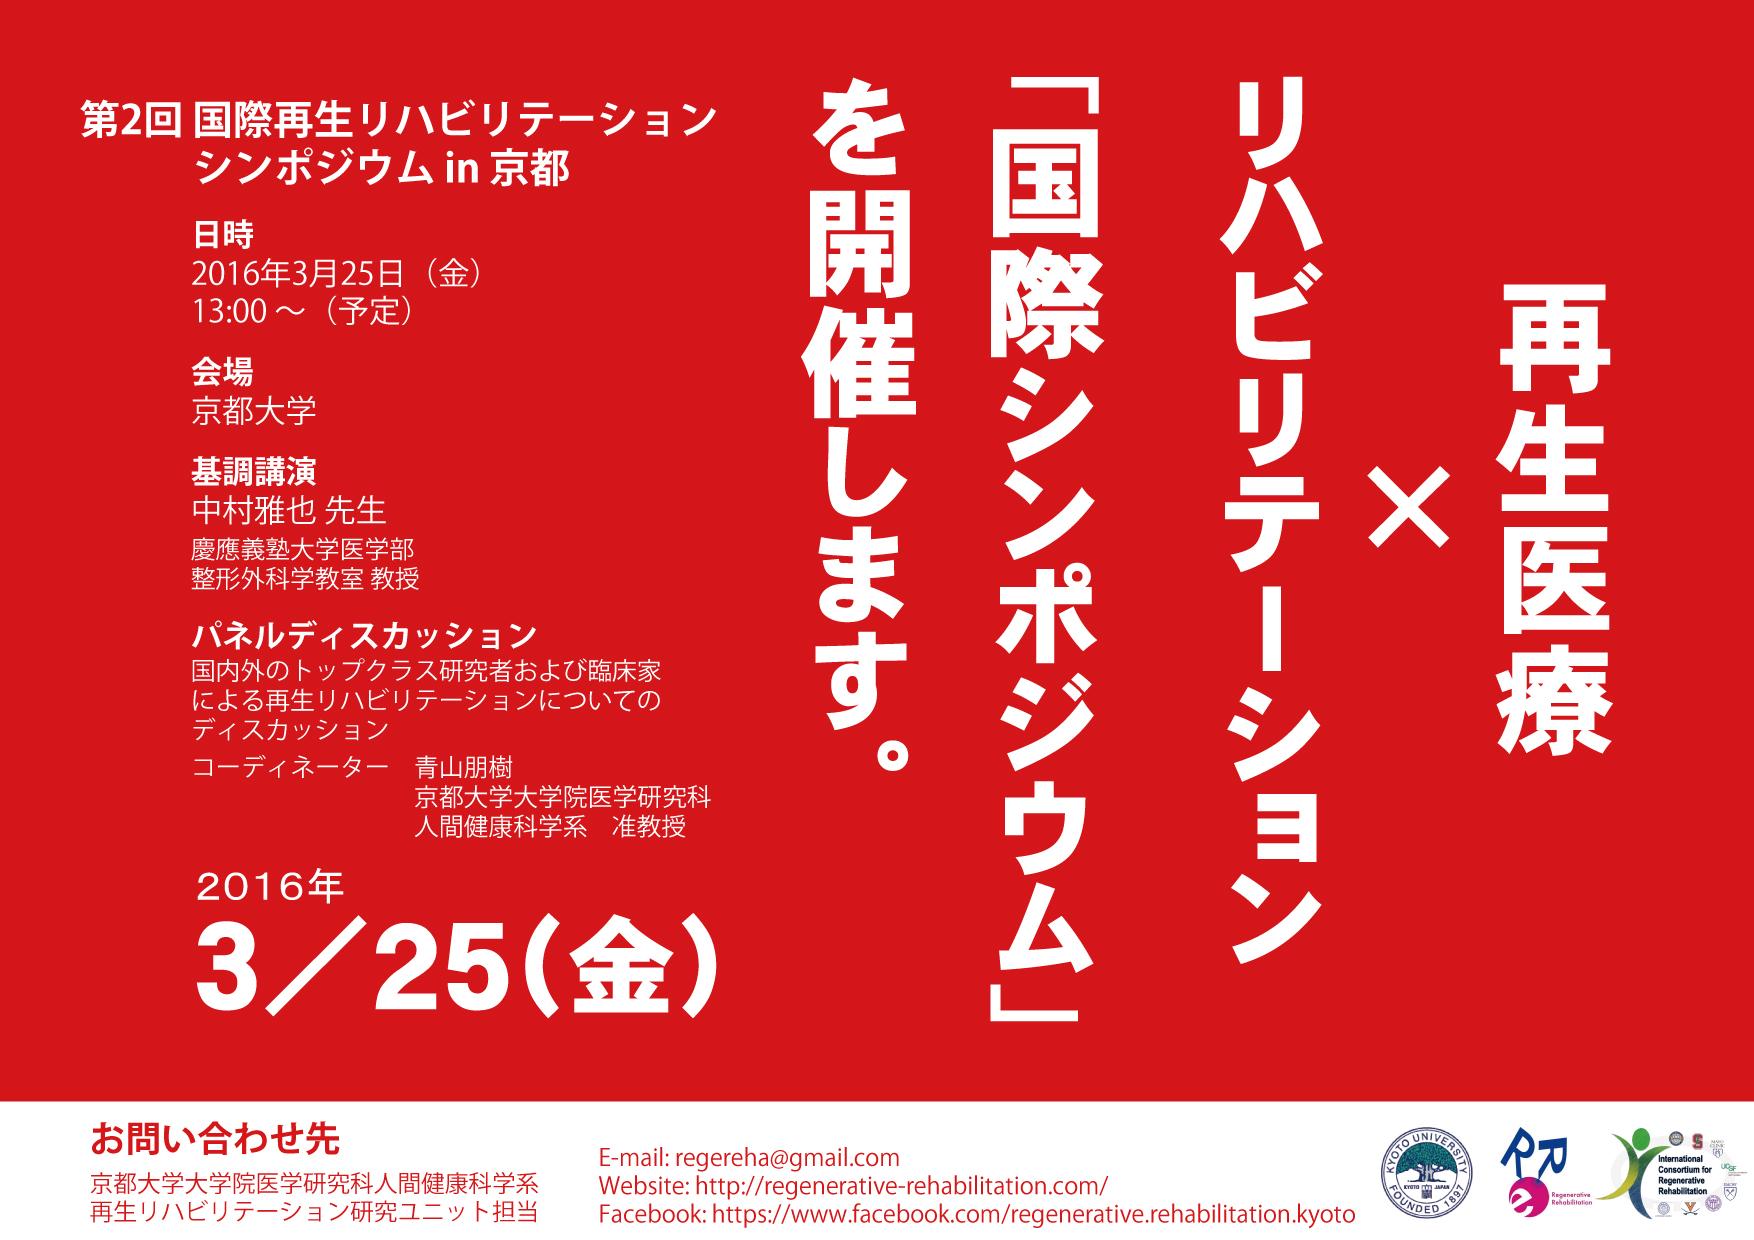 Poster1(2nd international symposium on RegeReha)